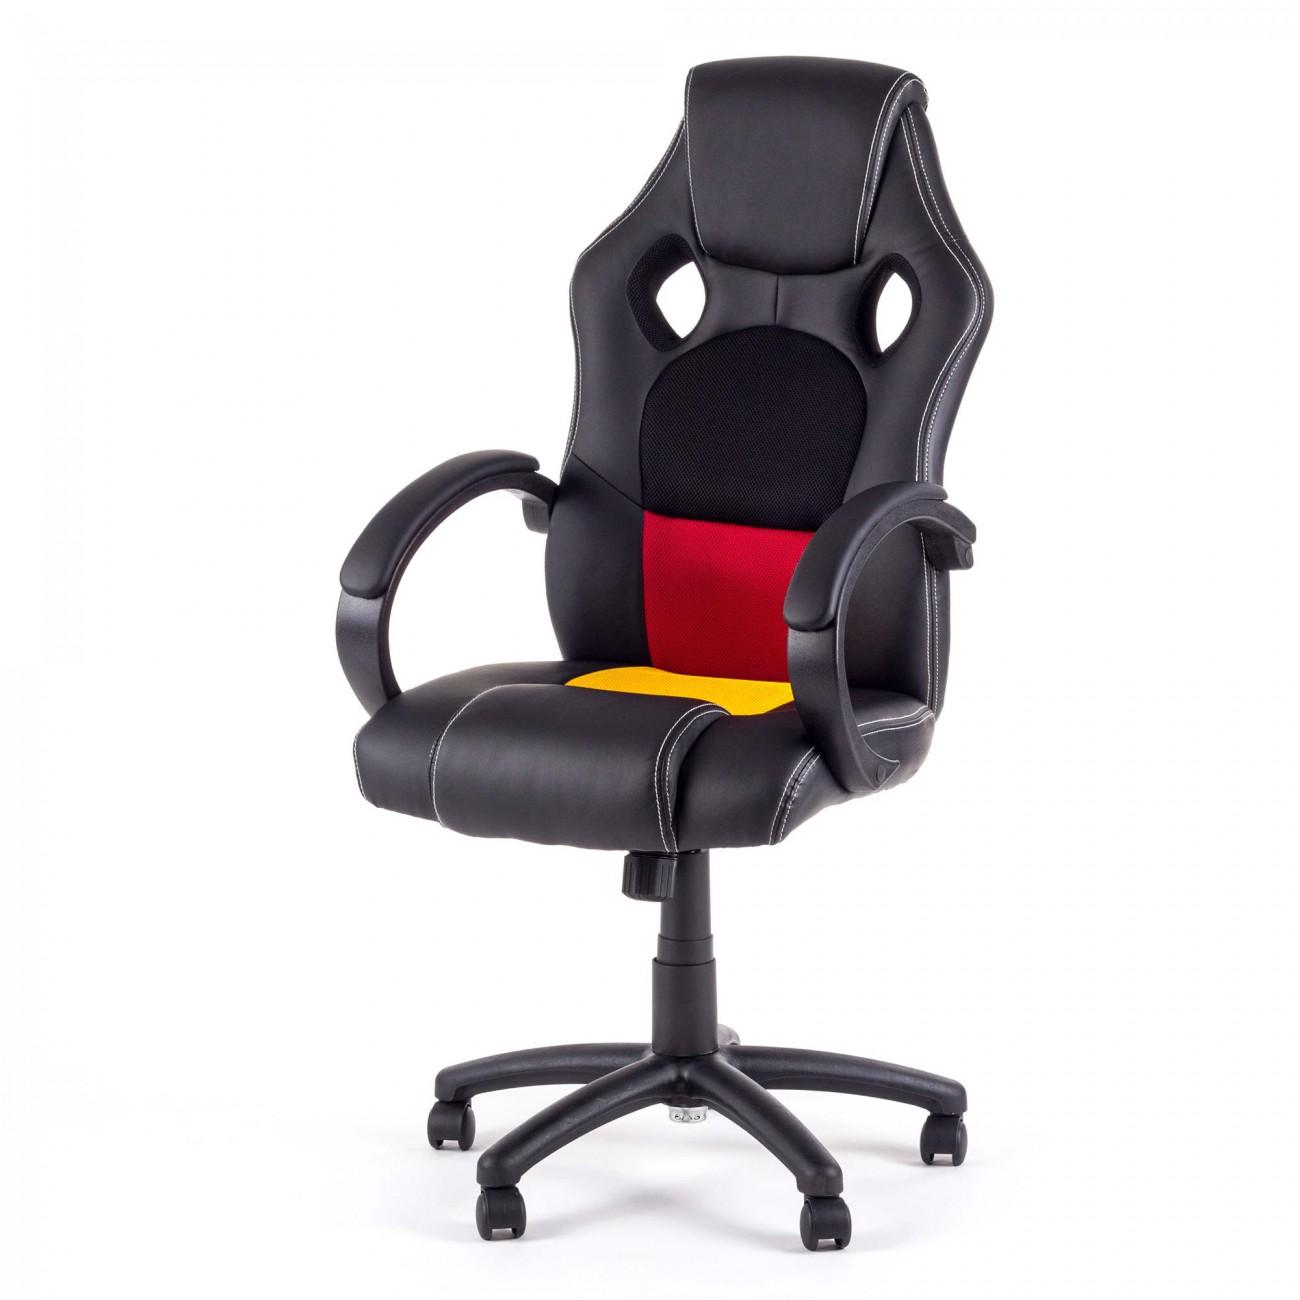 chaise bureau fauteuil si ge racing gamer sportiv ordinateur accoudoir v8 my sit ebay. Black Bedroom Furniture Sets. Home Design Ideas